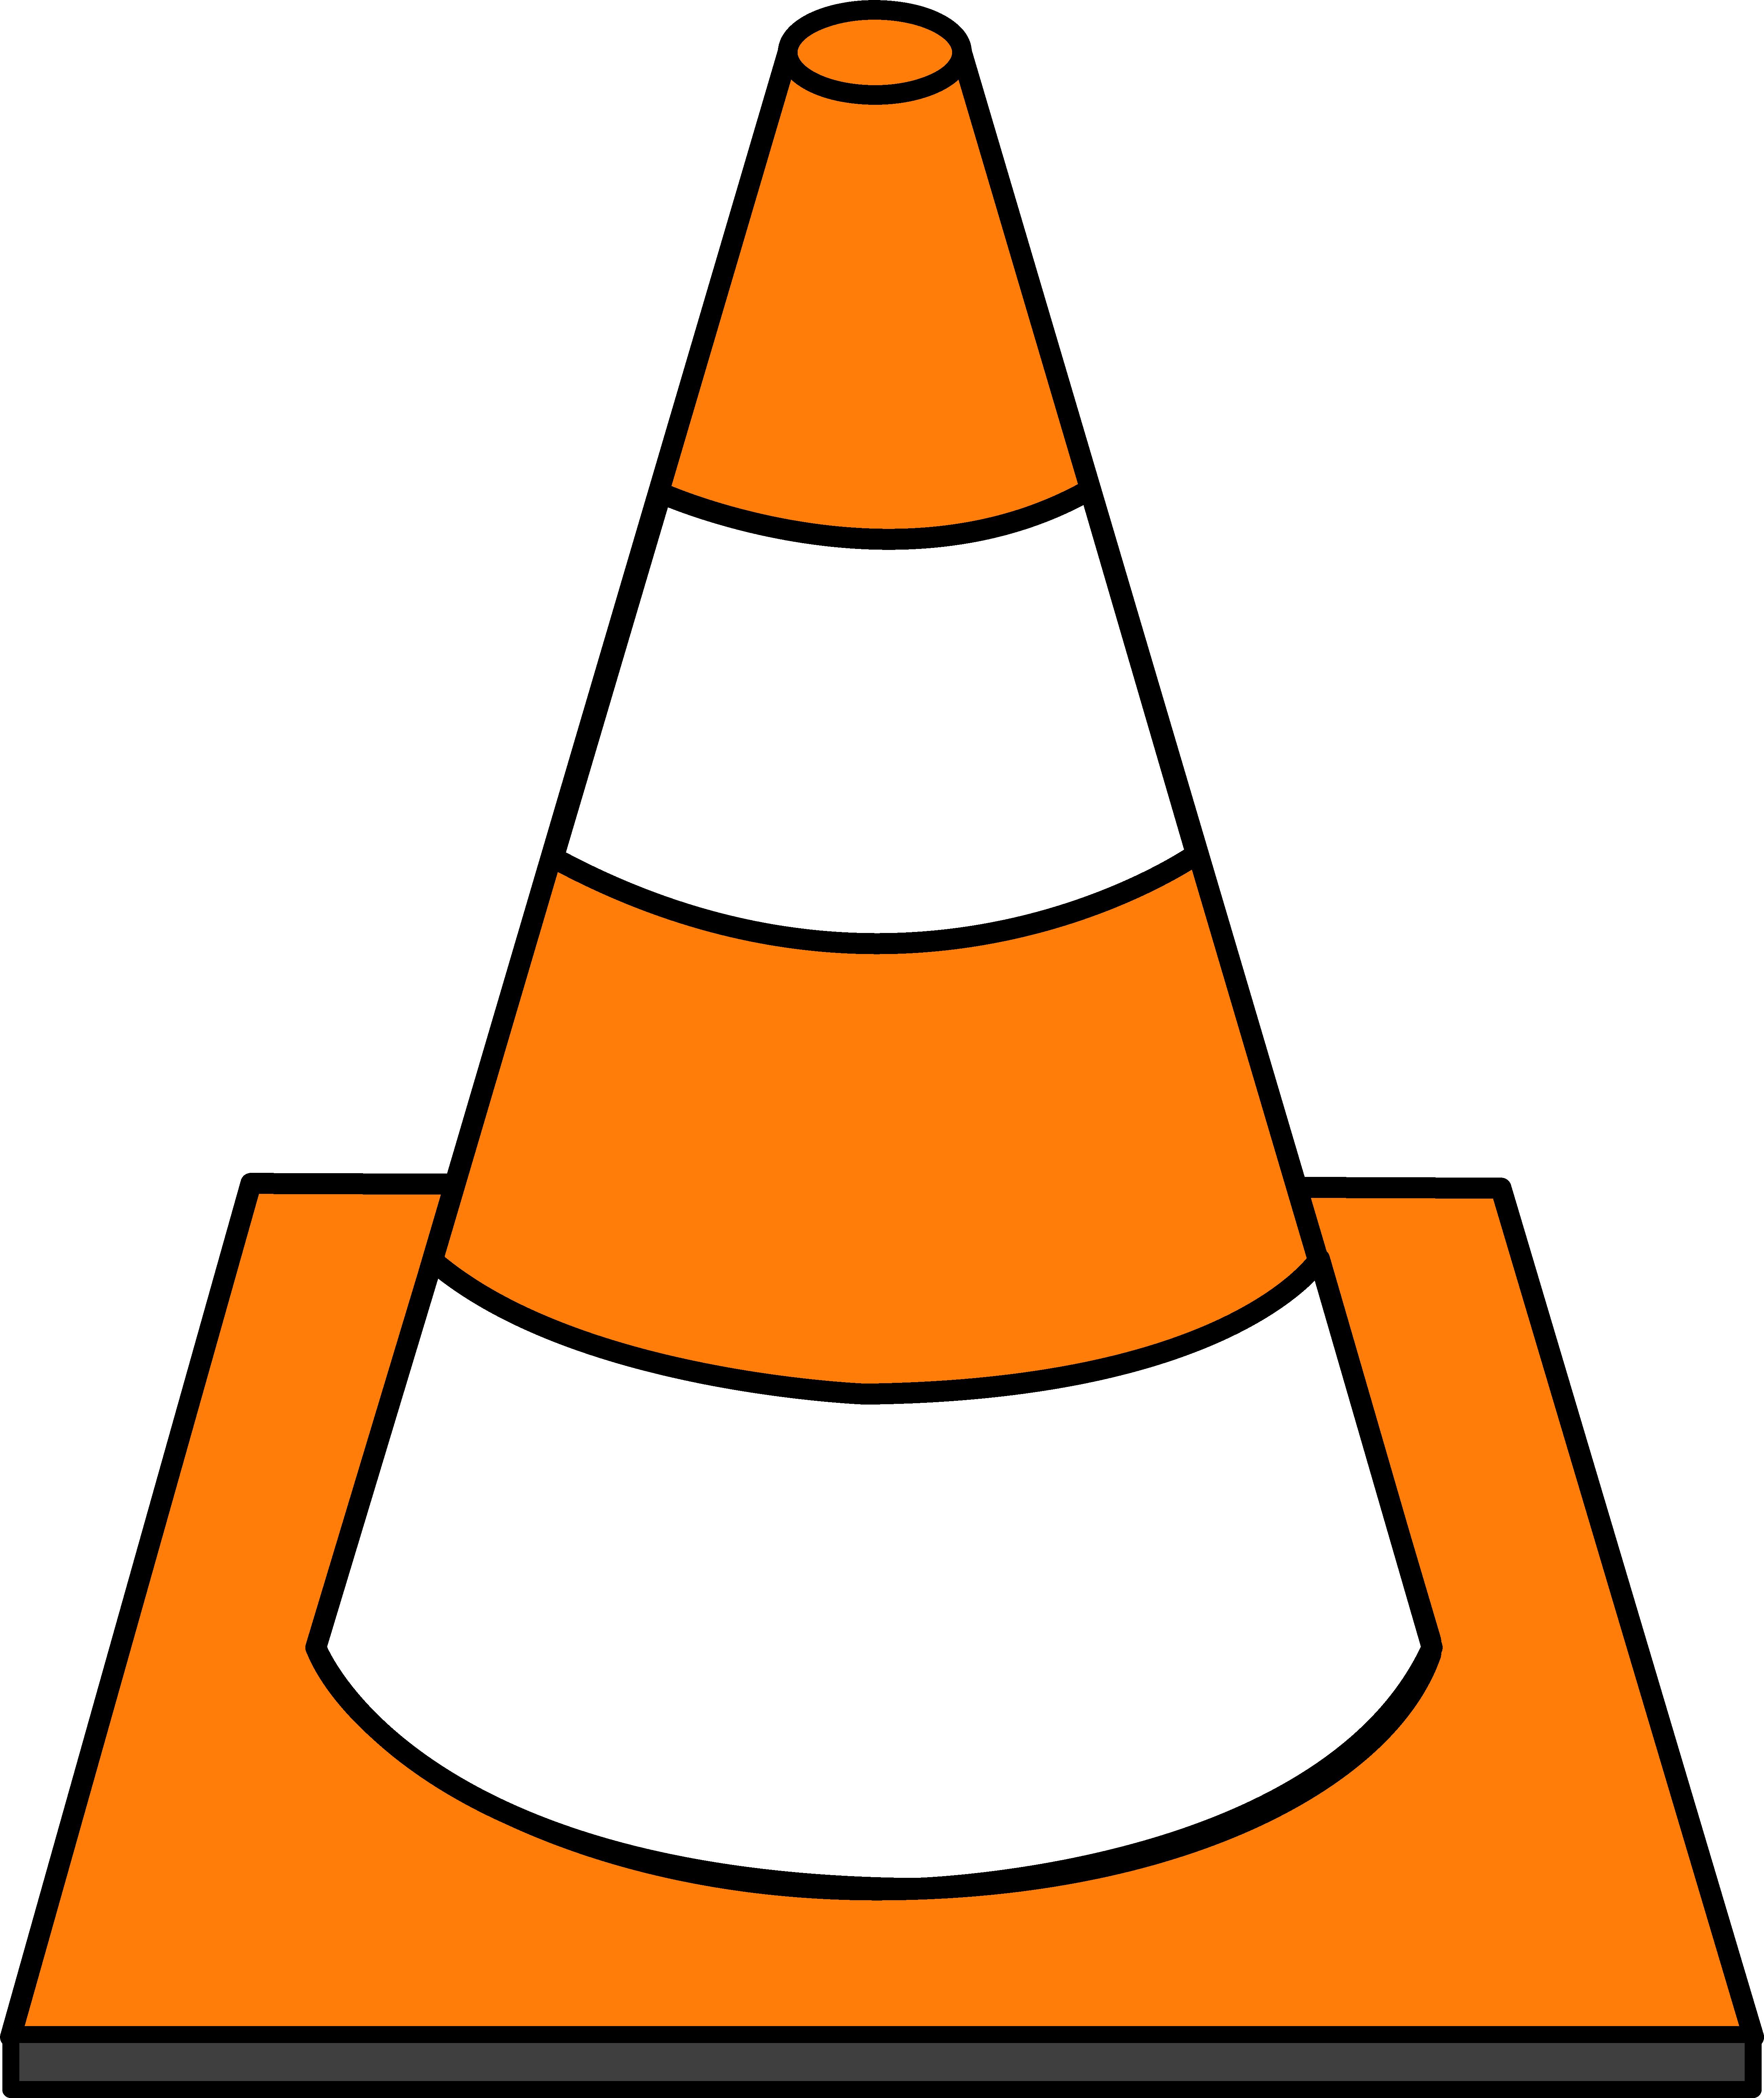 5199x6184 Cone Clip Art Many Interesting Cliparts